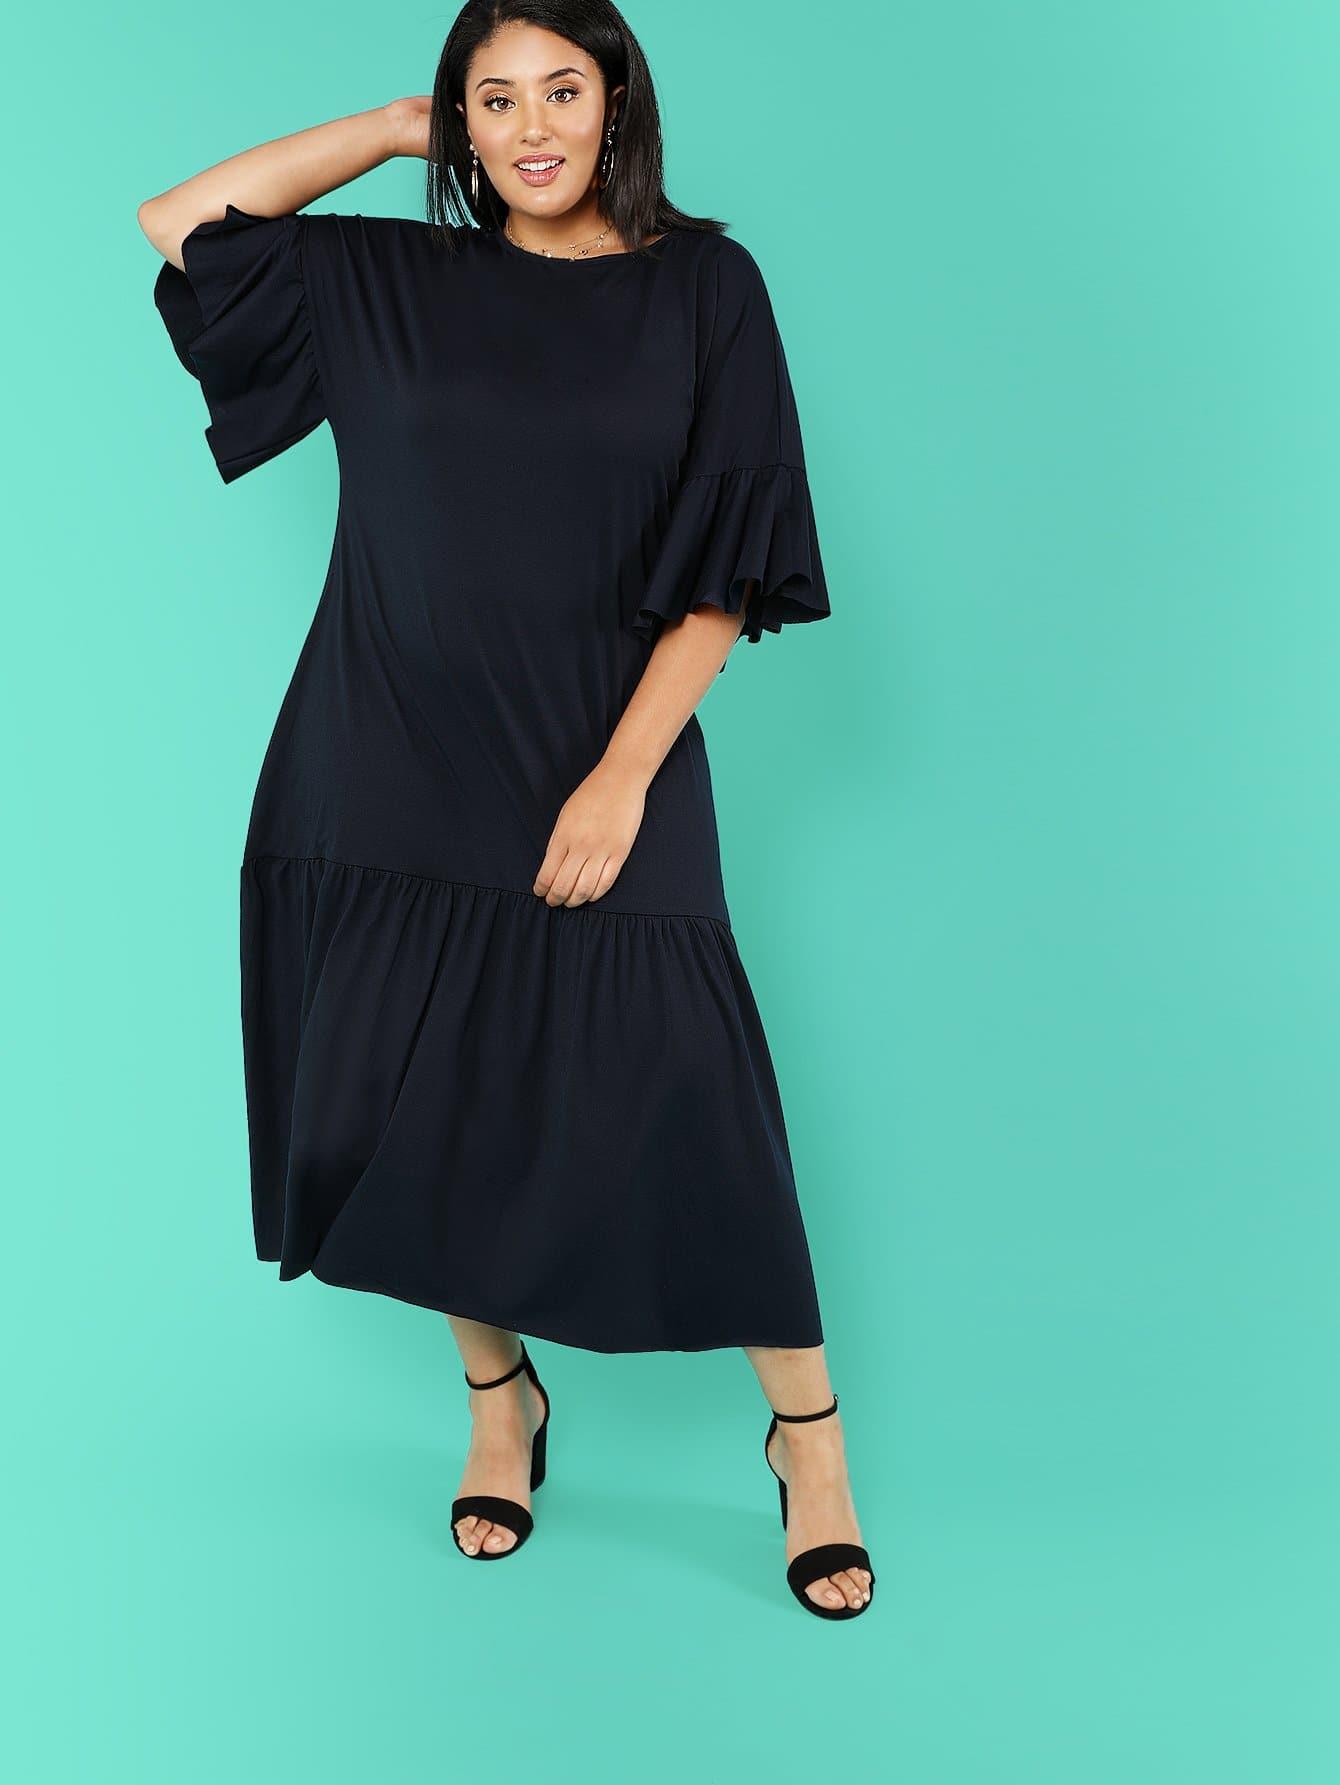 Solid Ruffle Trim Oversized Dress one side ruffle trim solid dress